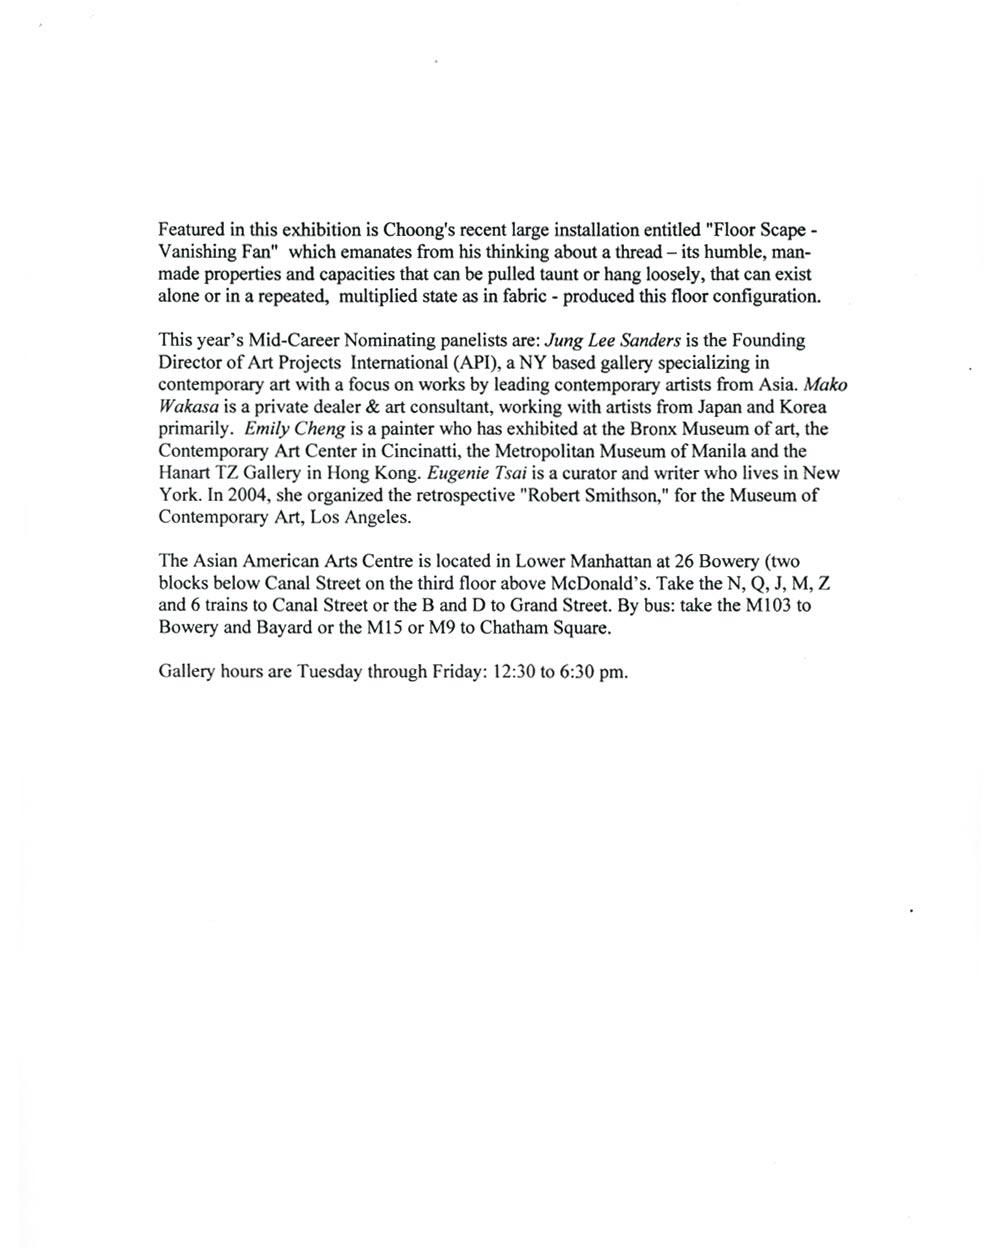 Mayumi Terada/Choong Sup Lim, press release, pg 2